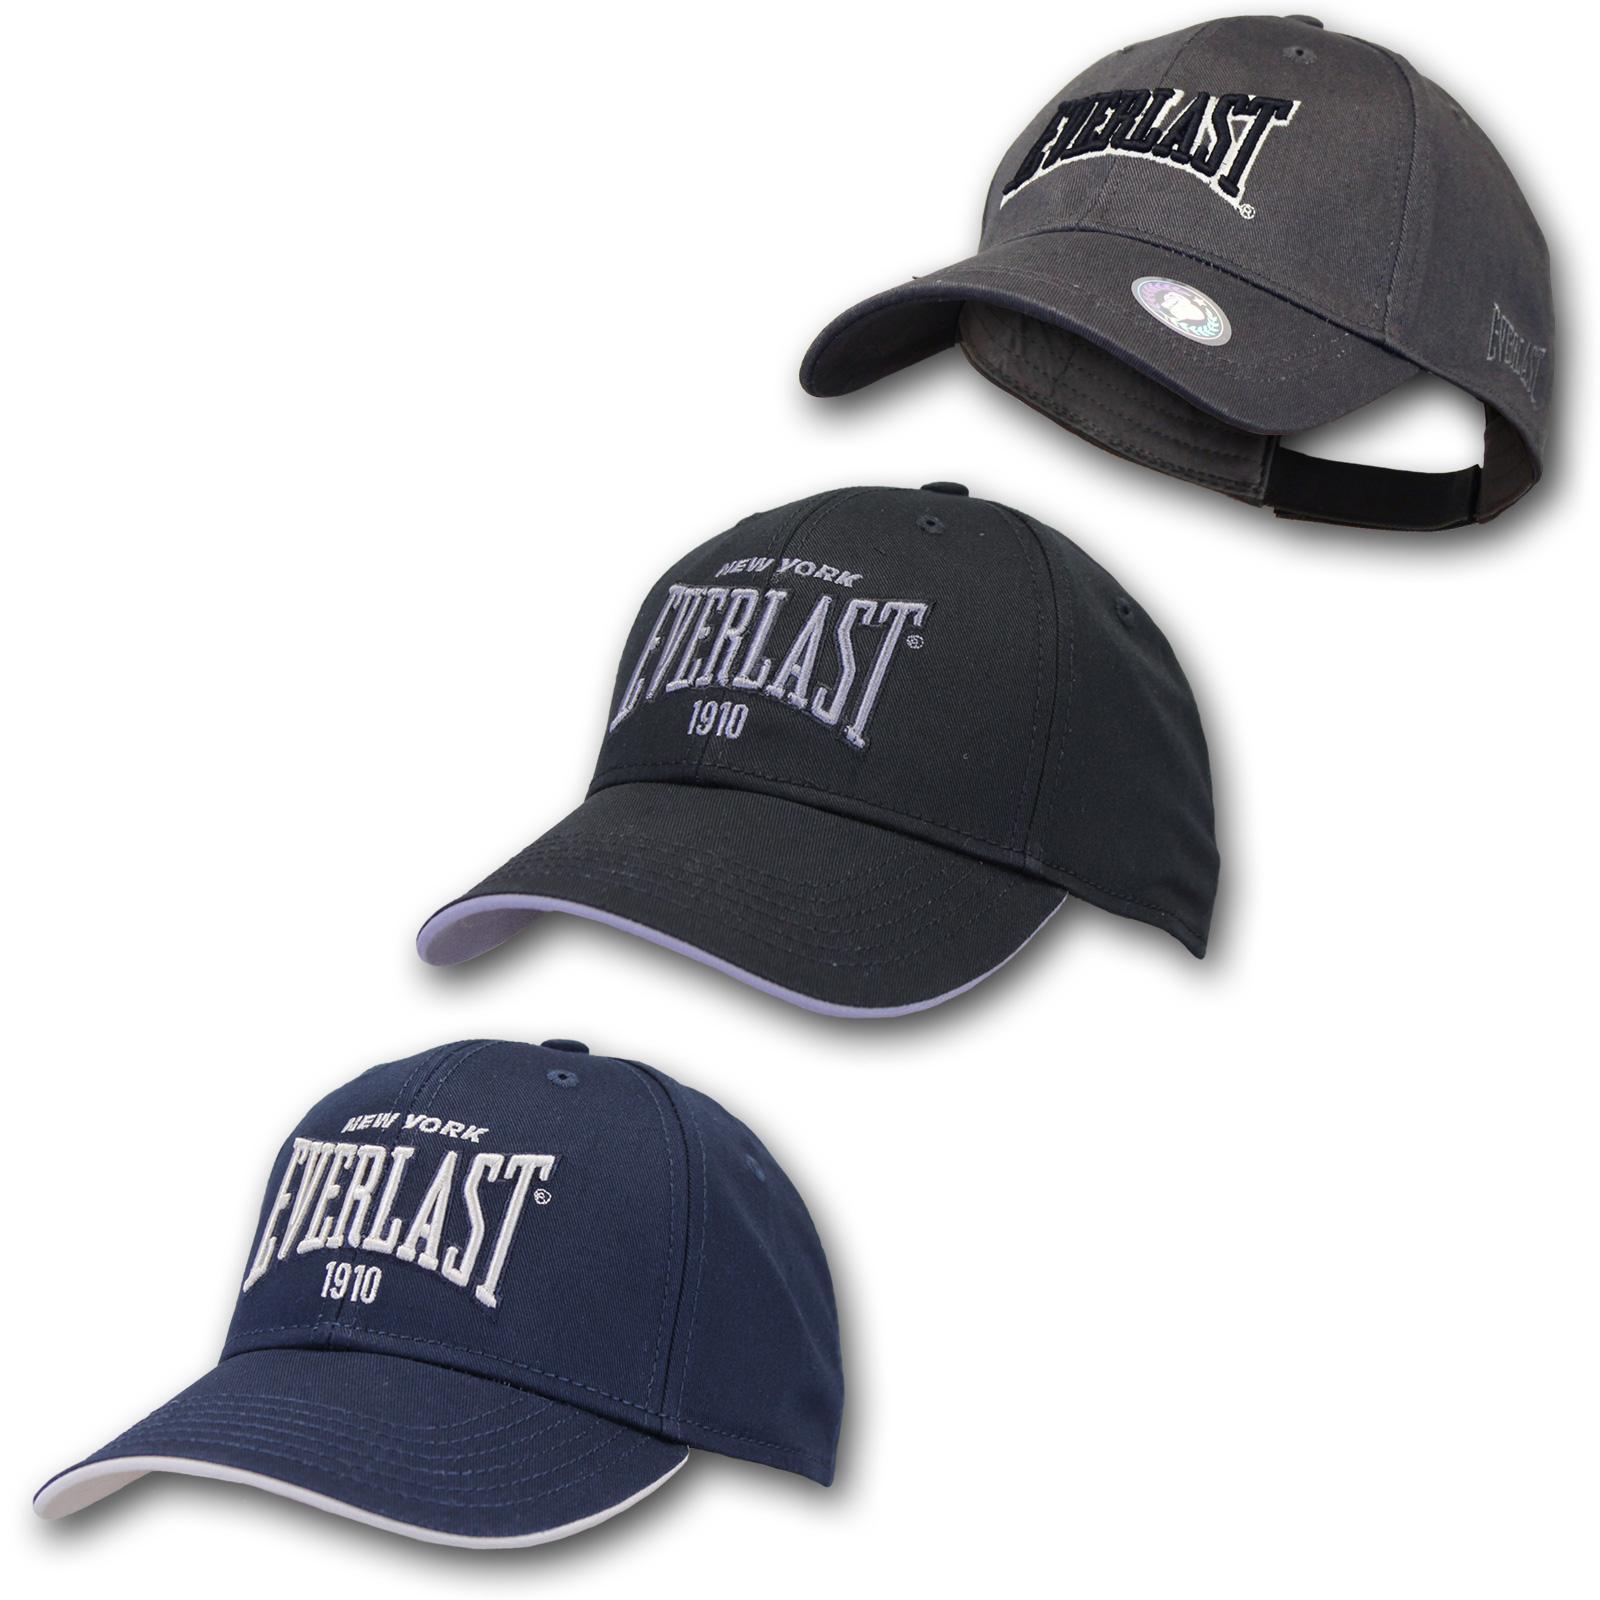 Everlast Herren Logo Baseball Cap Kappe Mütze Basecap Hut Snapback